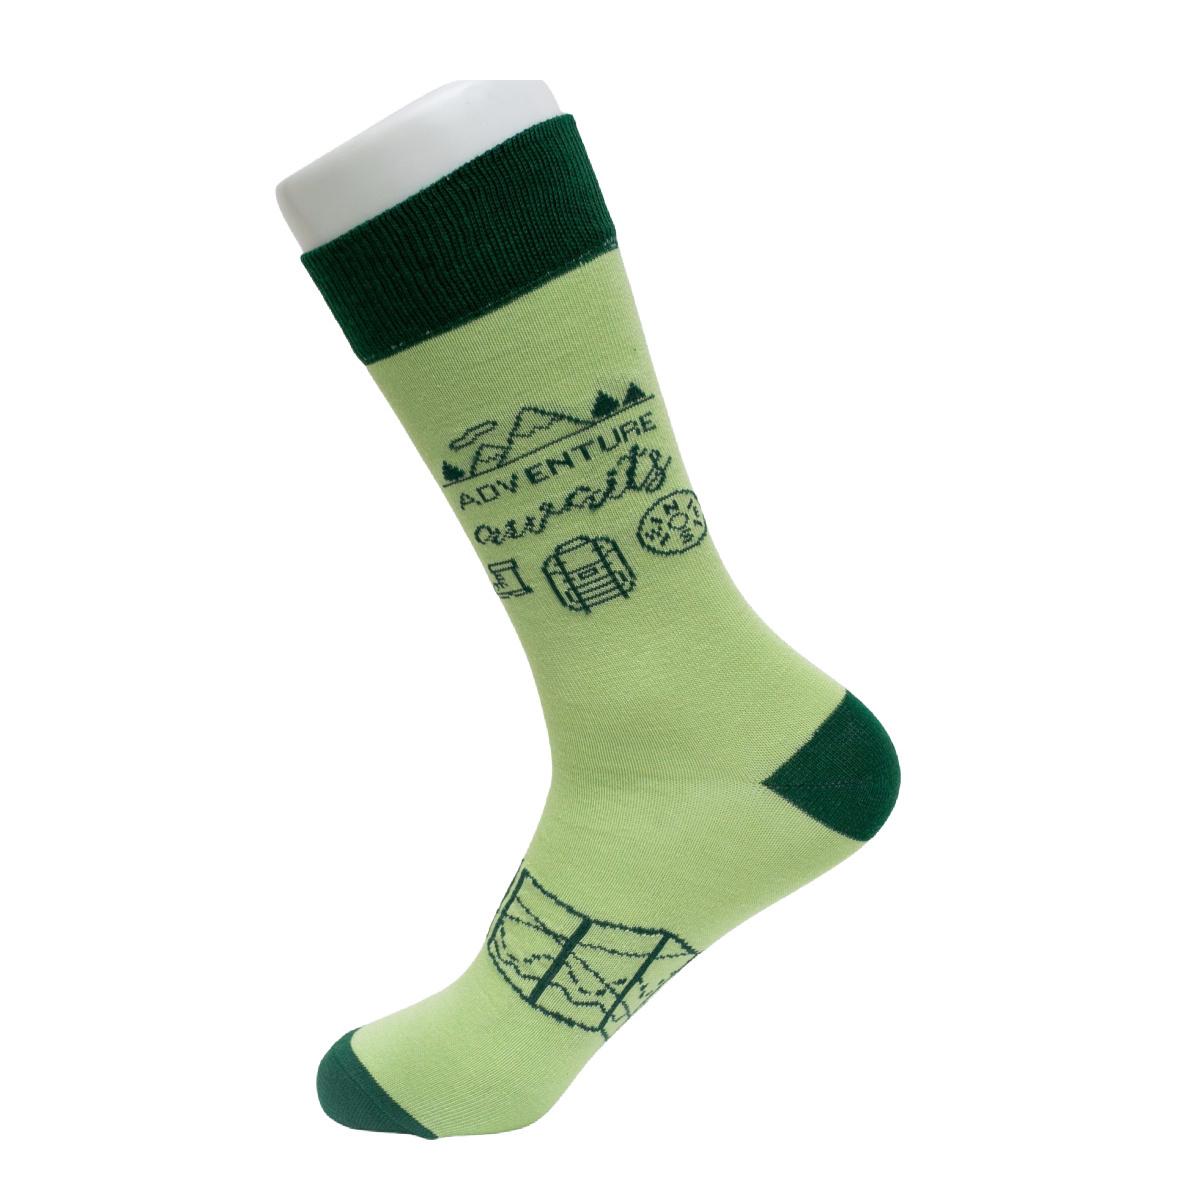 Socks Atomica Socks Atomica Adventure Awaits